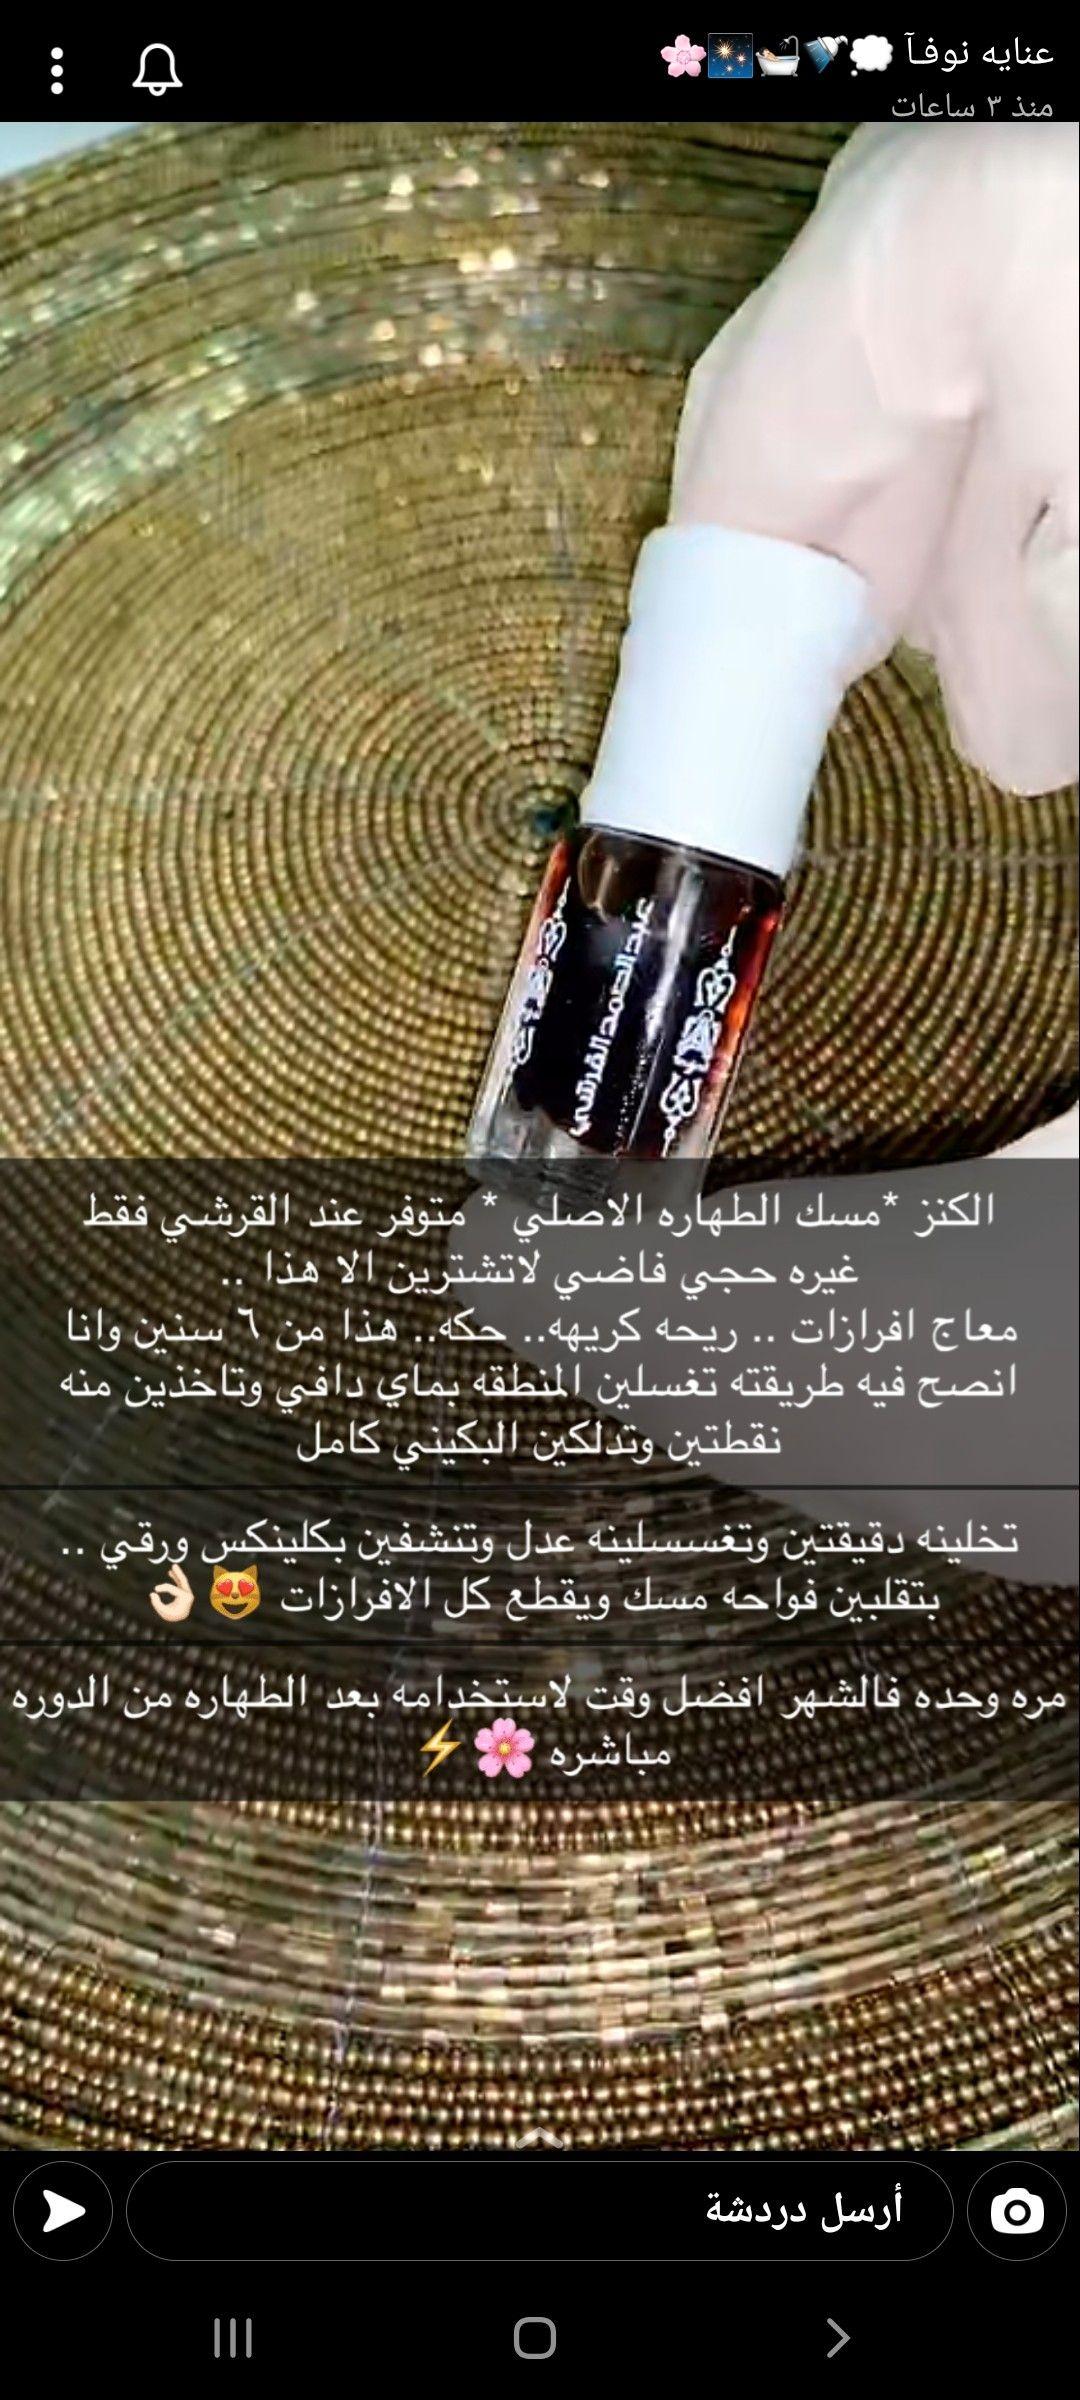 Pin By Asma Alotaibi On عناية Perfume Scents Scents Perfume